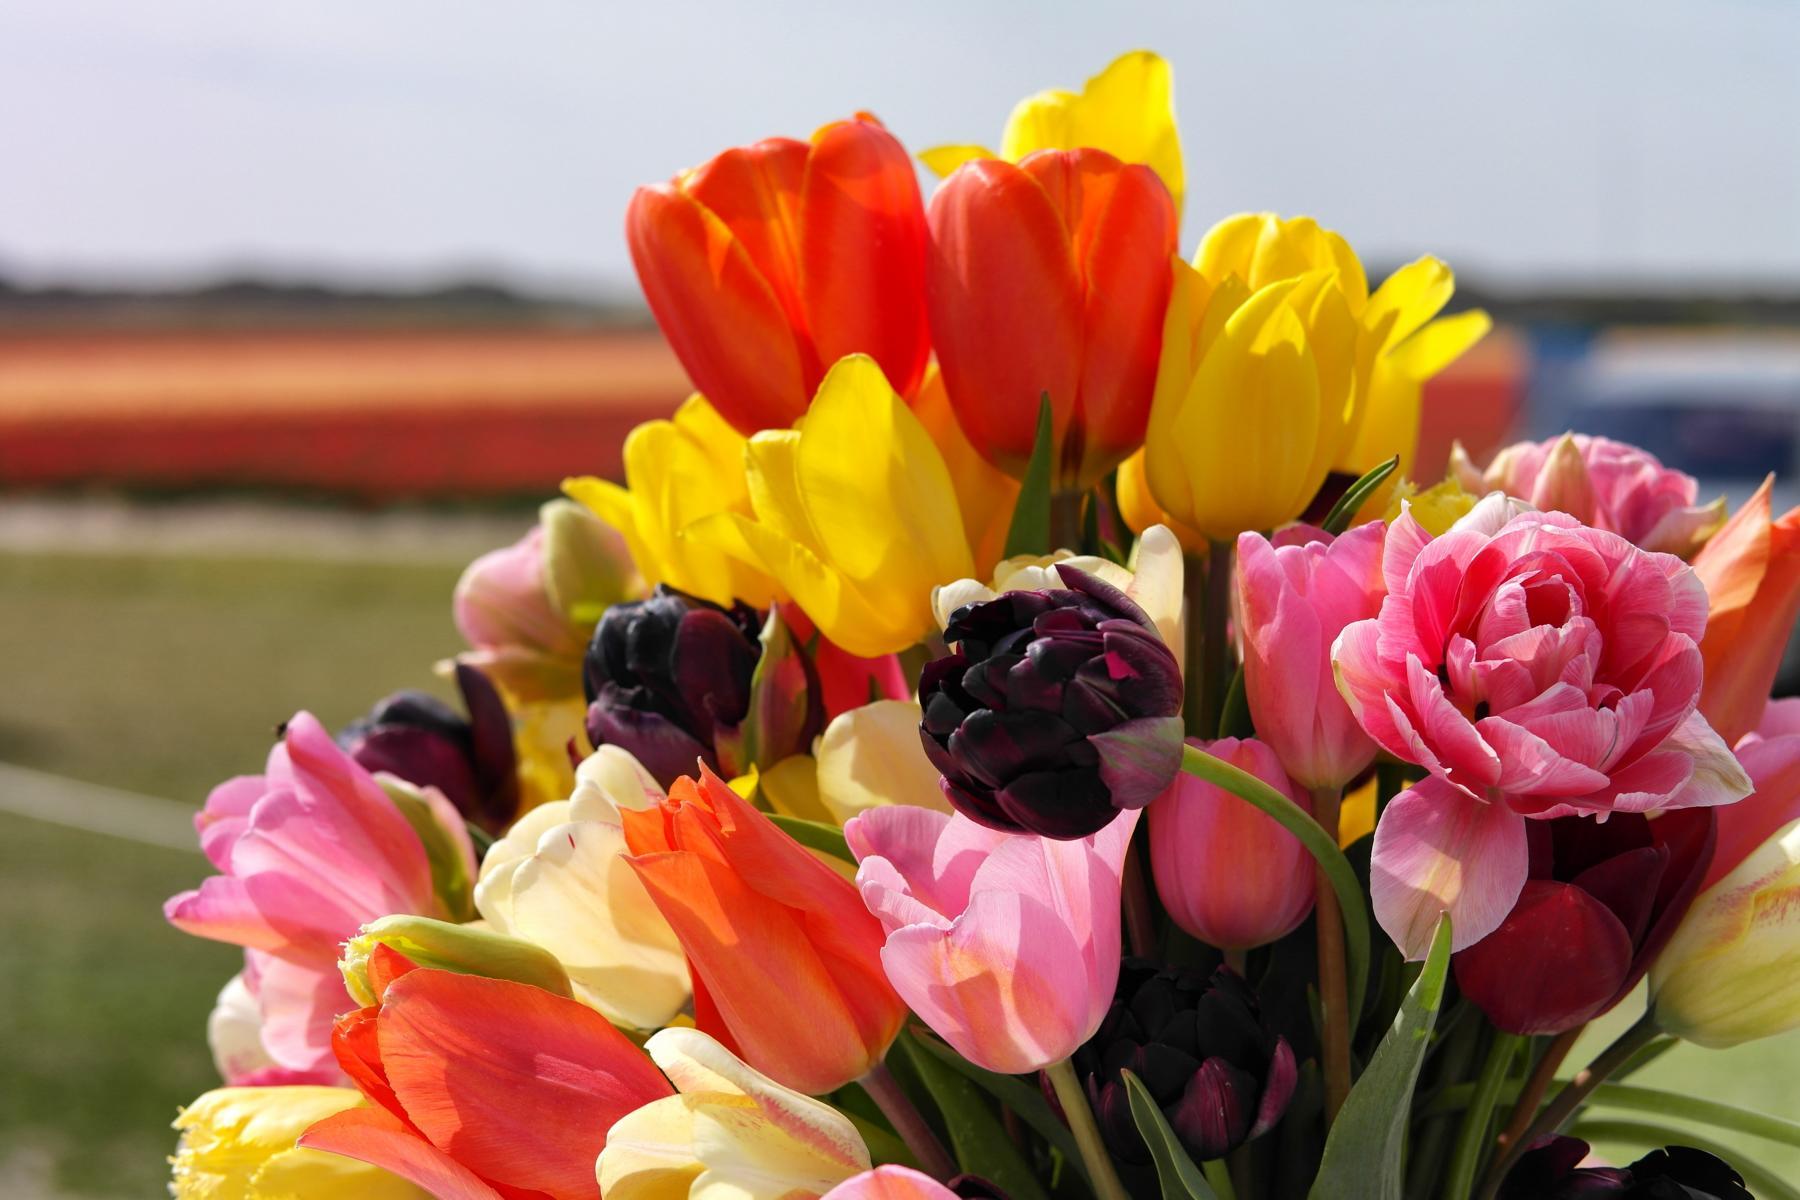 Tulpenblüte in Holland - Bloeiend Zijpe